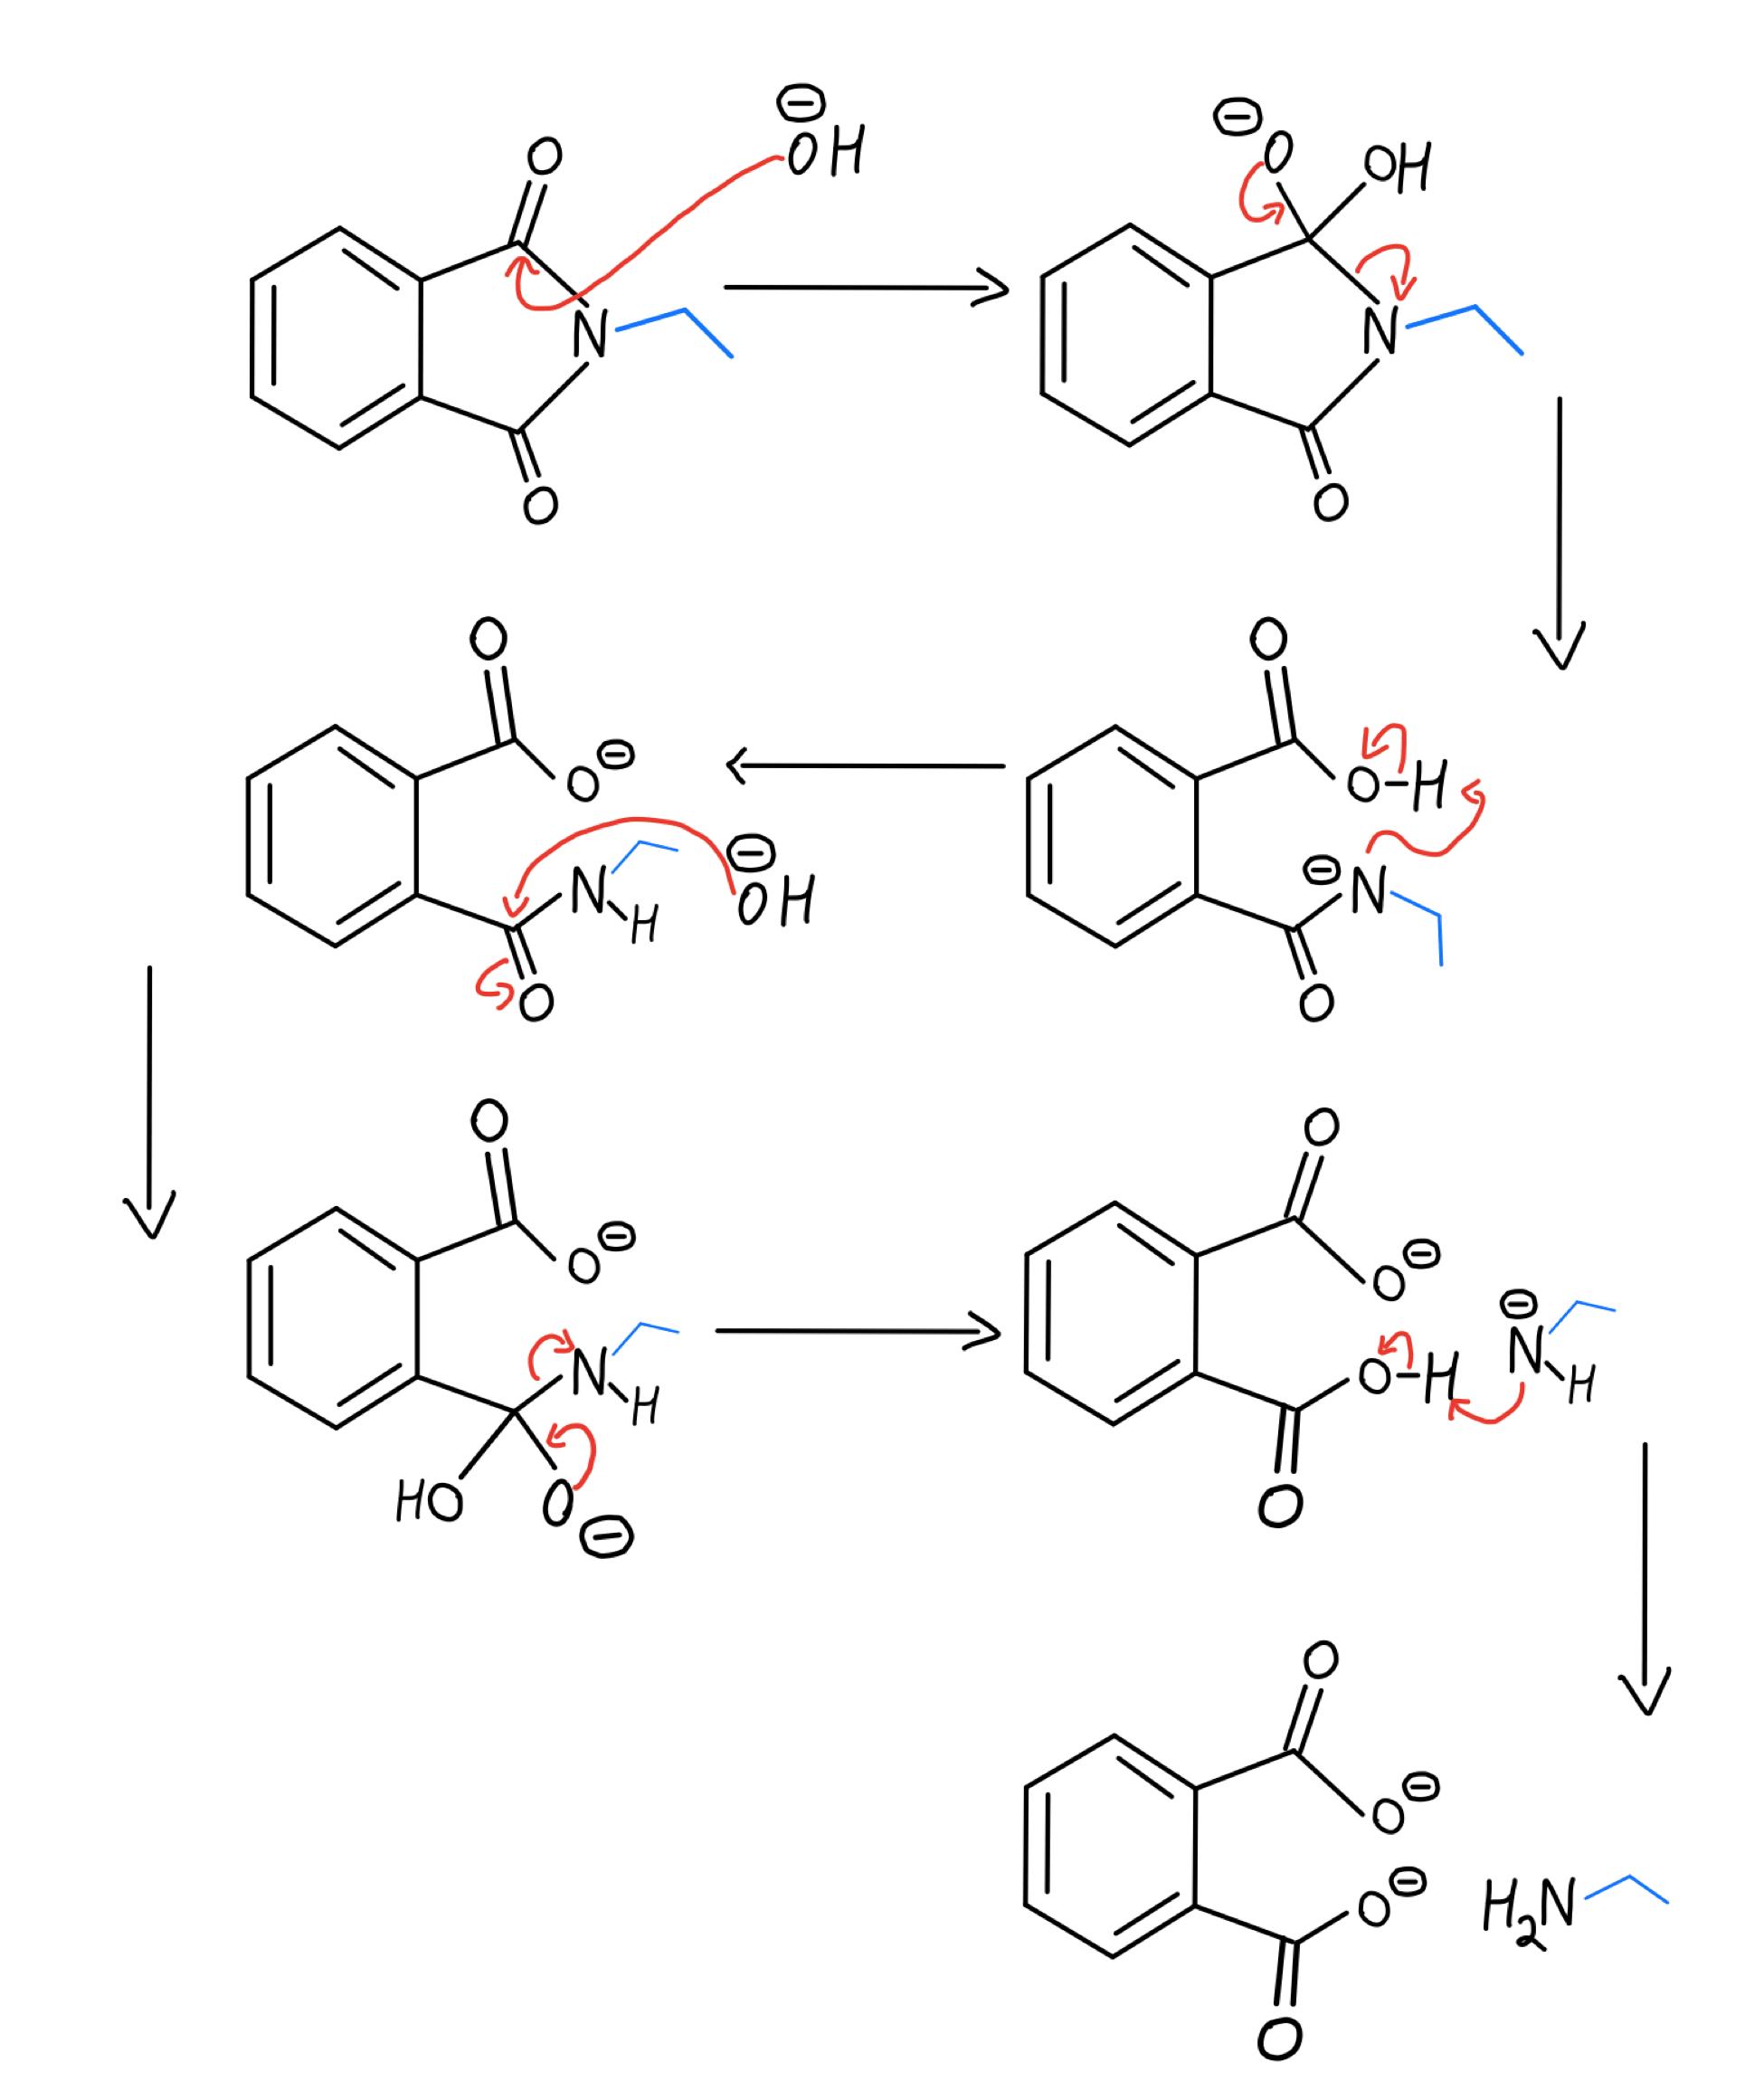 Basic hydrolysis mechanism